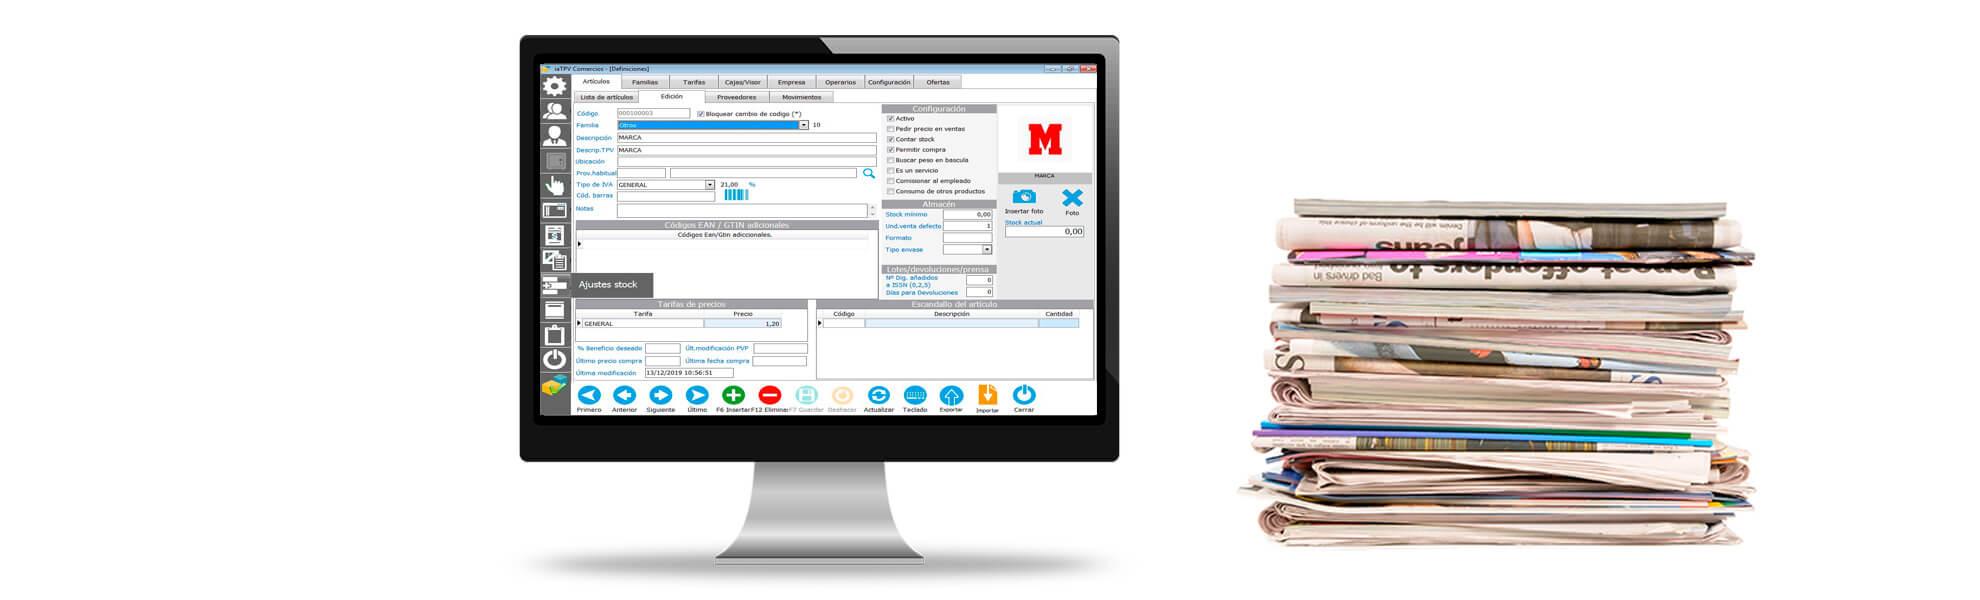 TPV software para quioscos y prensa